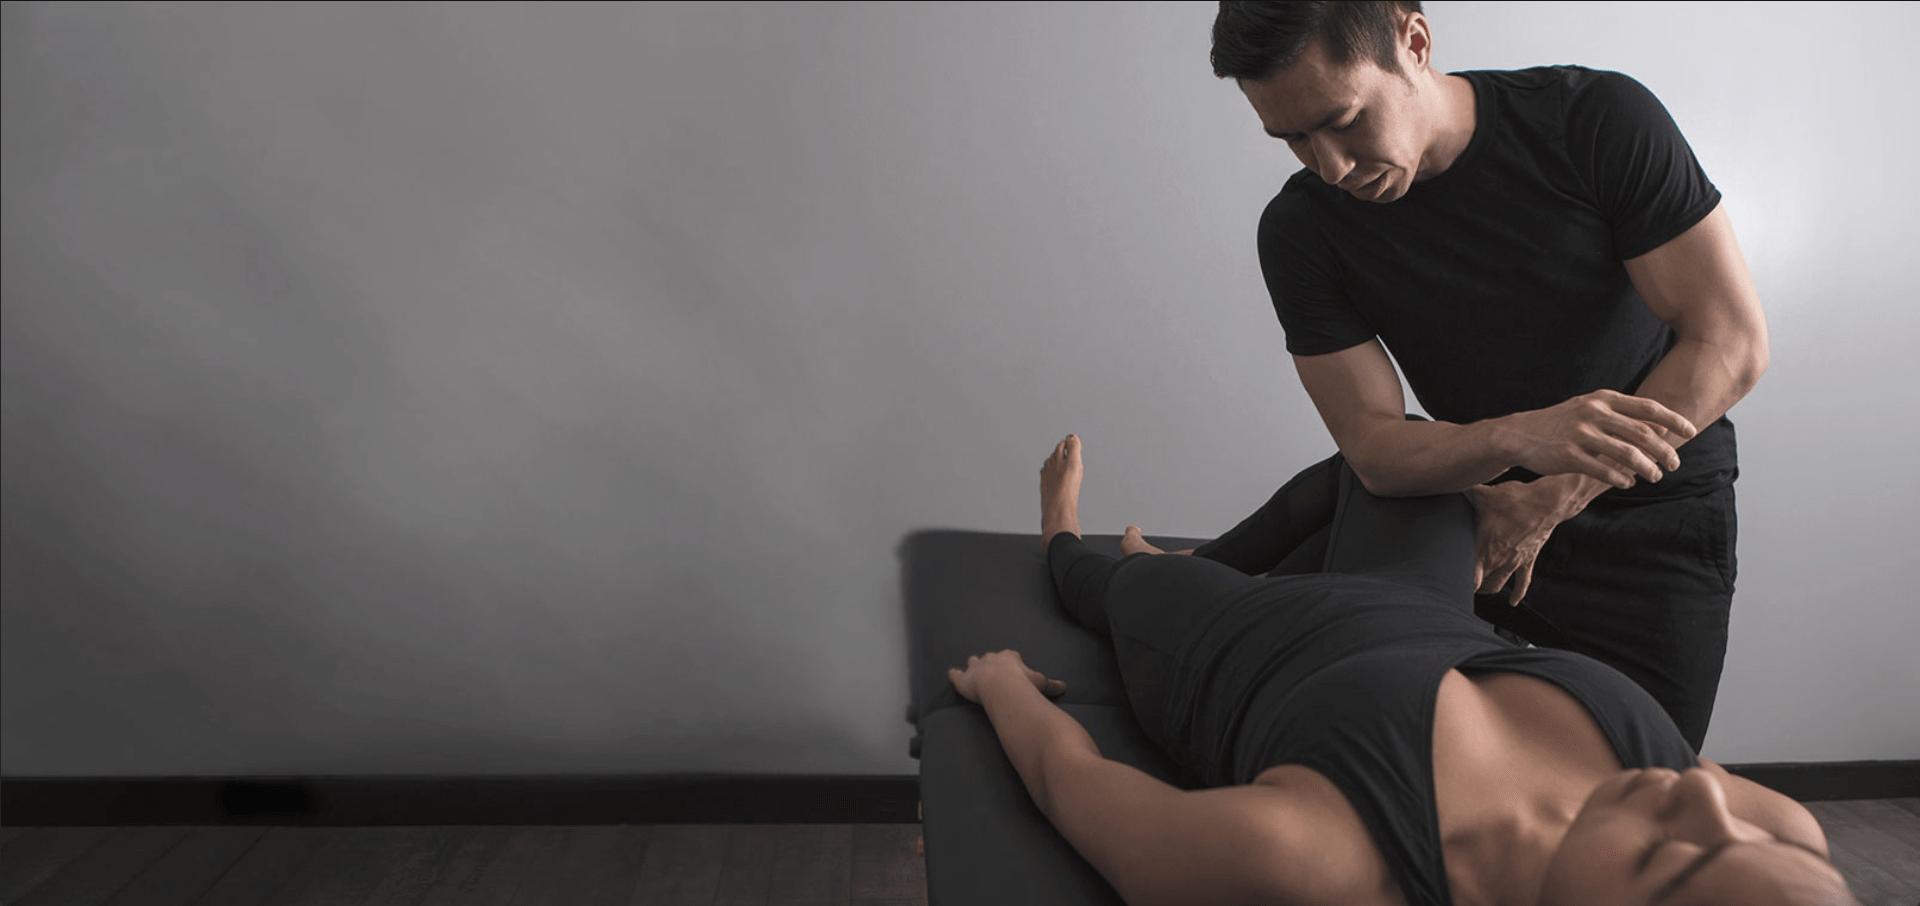 MSK chiropractor performing thigh massage